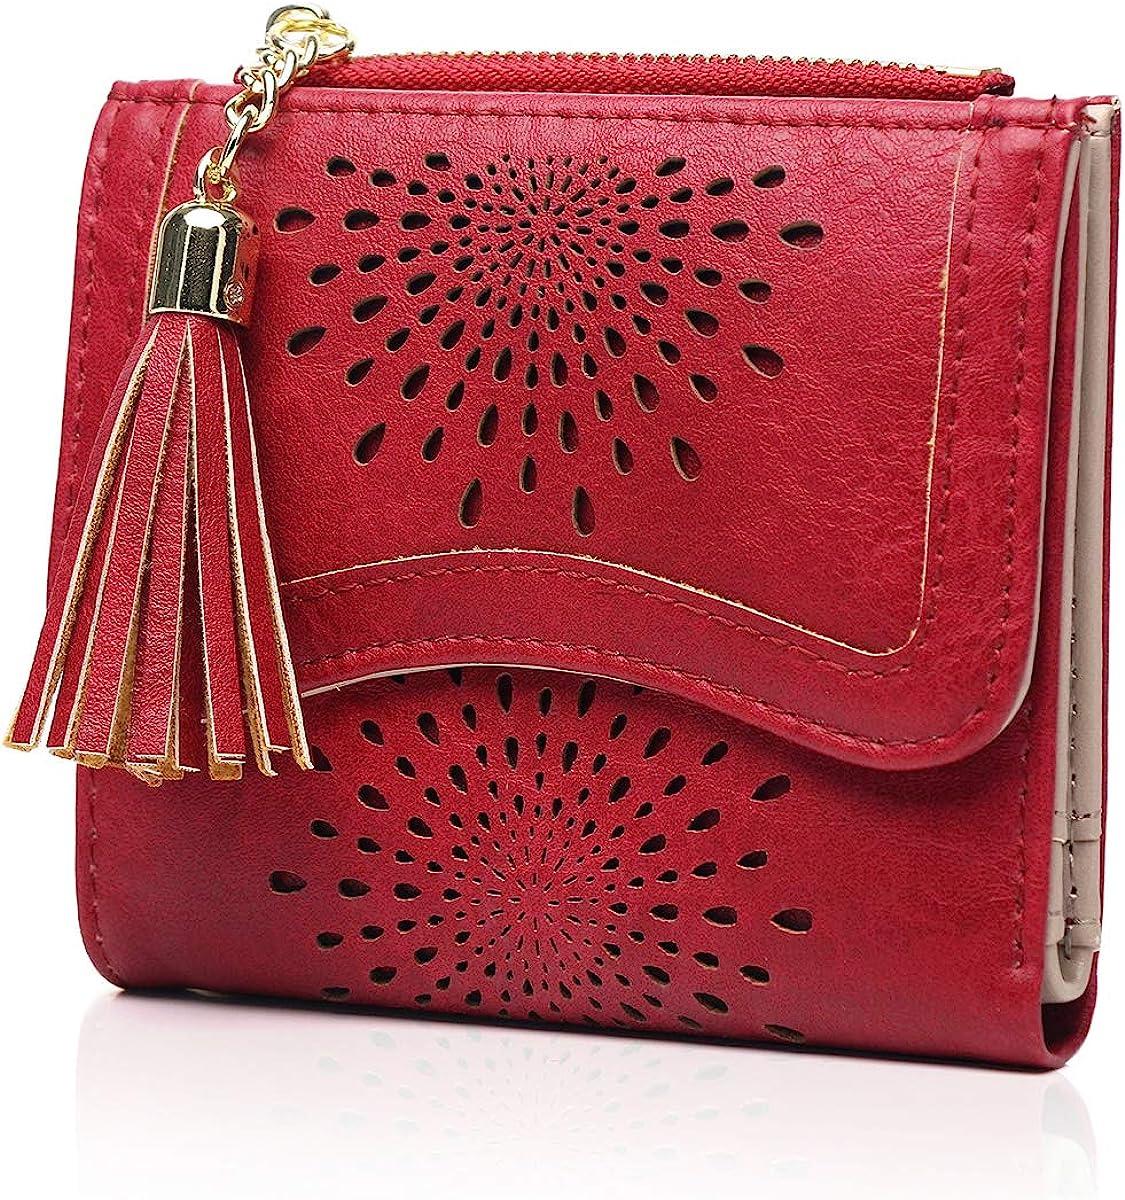 YOVIEE Small RFID Wallet for Women Card Holder Organizer Girls Zipper PU Leather Tassel Pendant Design Coin Purse//Gift Box 24102